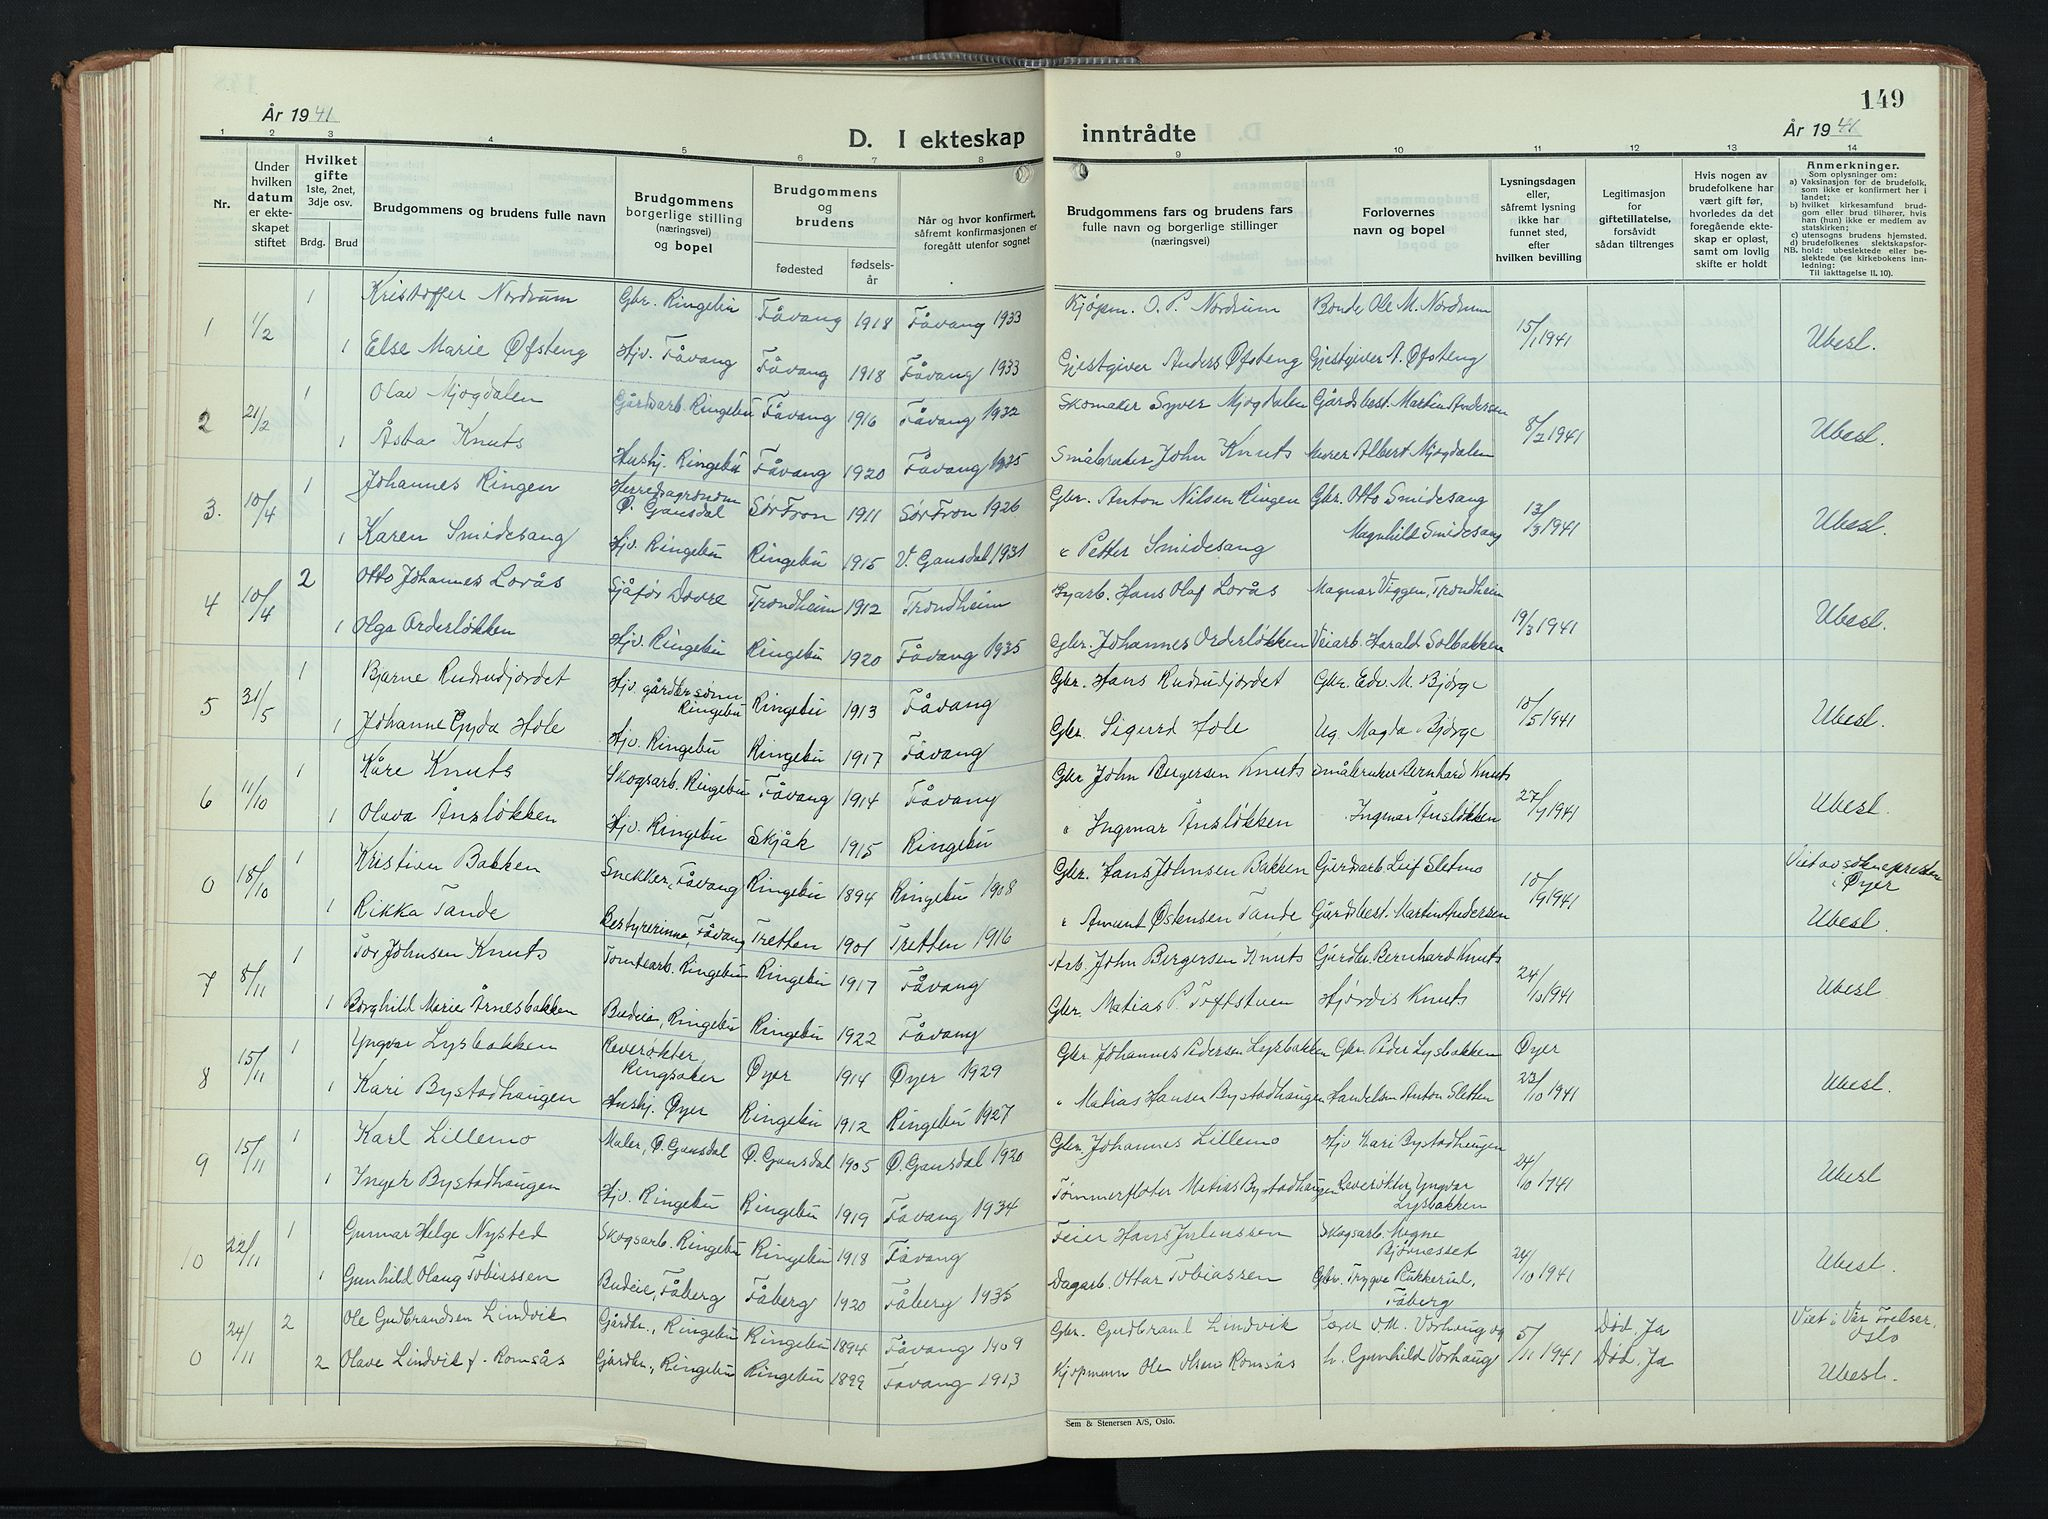 SAH, Ringebu prestekontor, Klokkerbok nr. 12, 1934-1949, s. 149